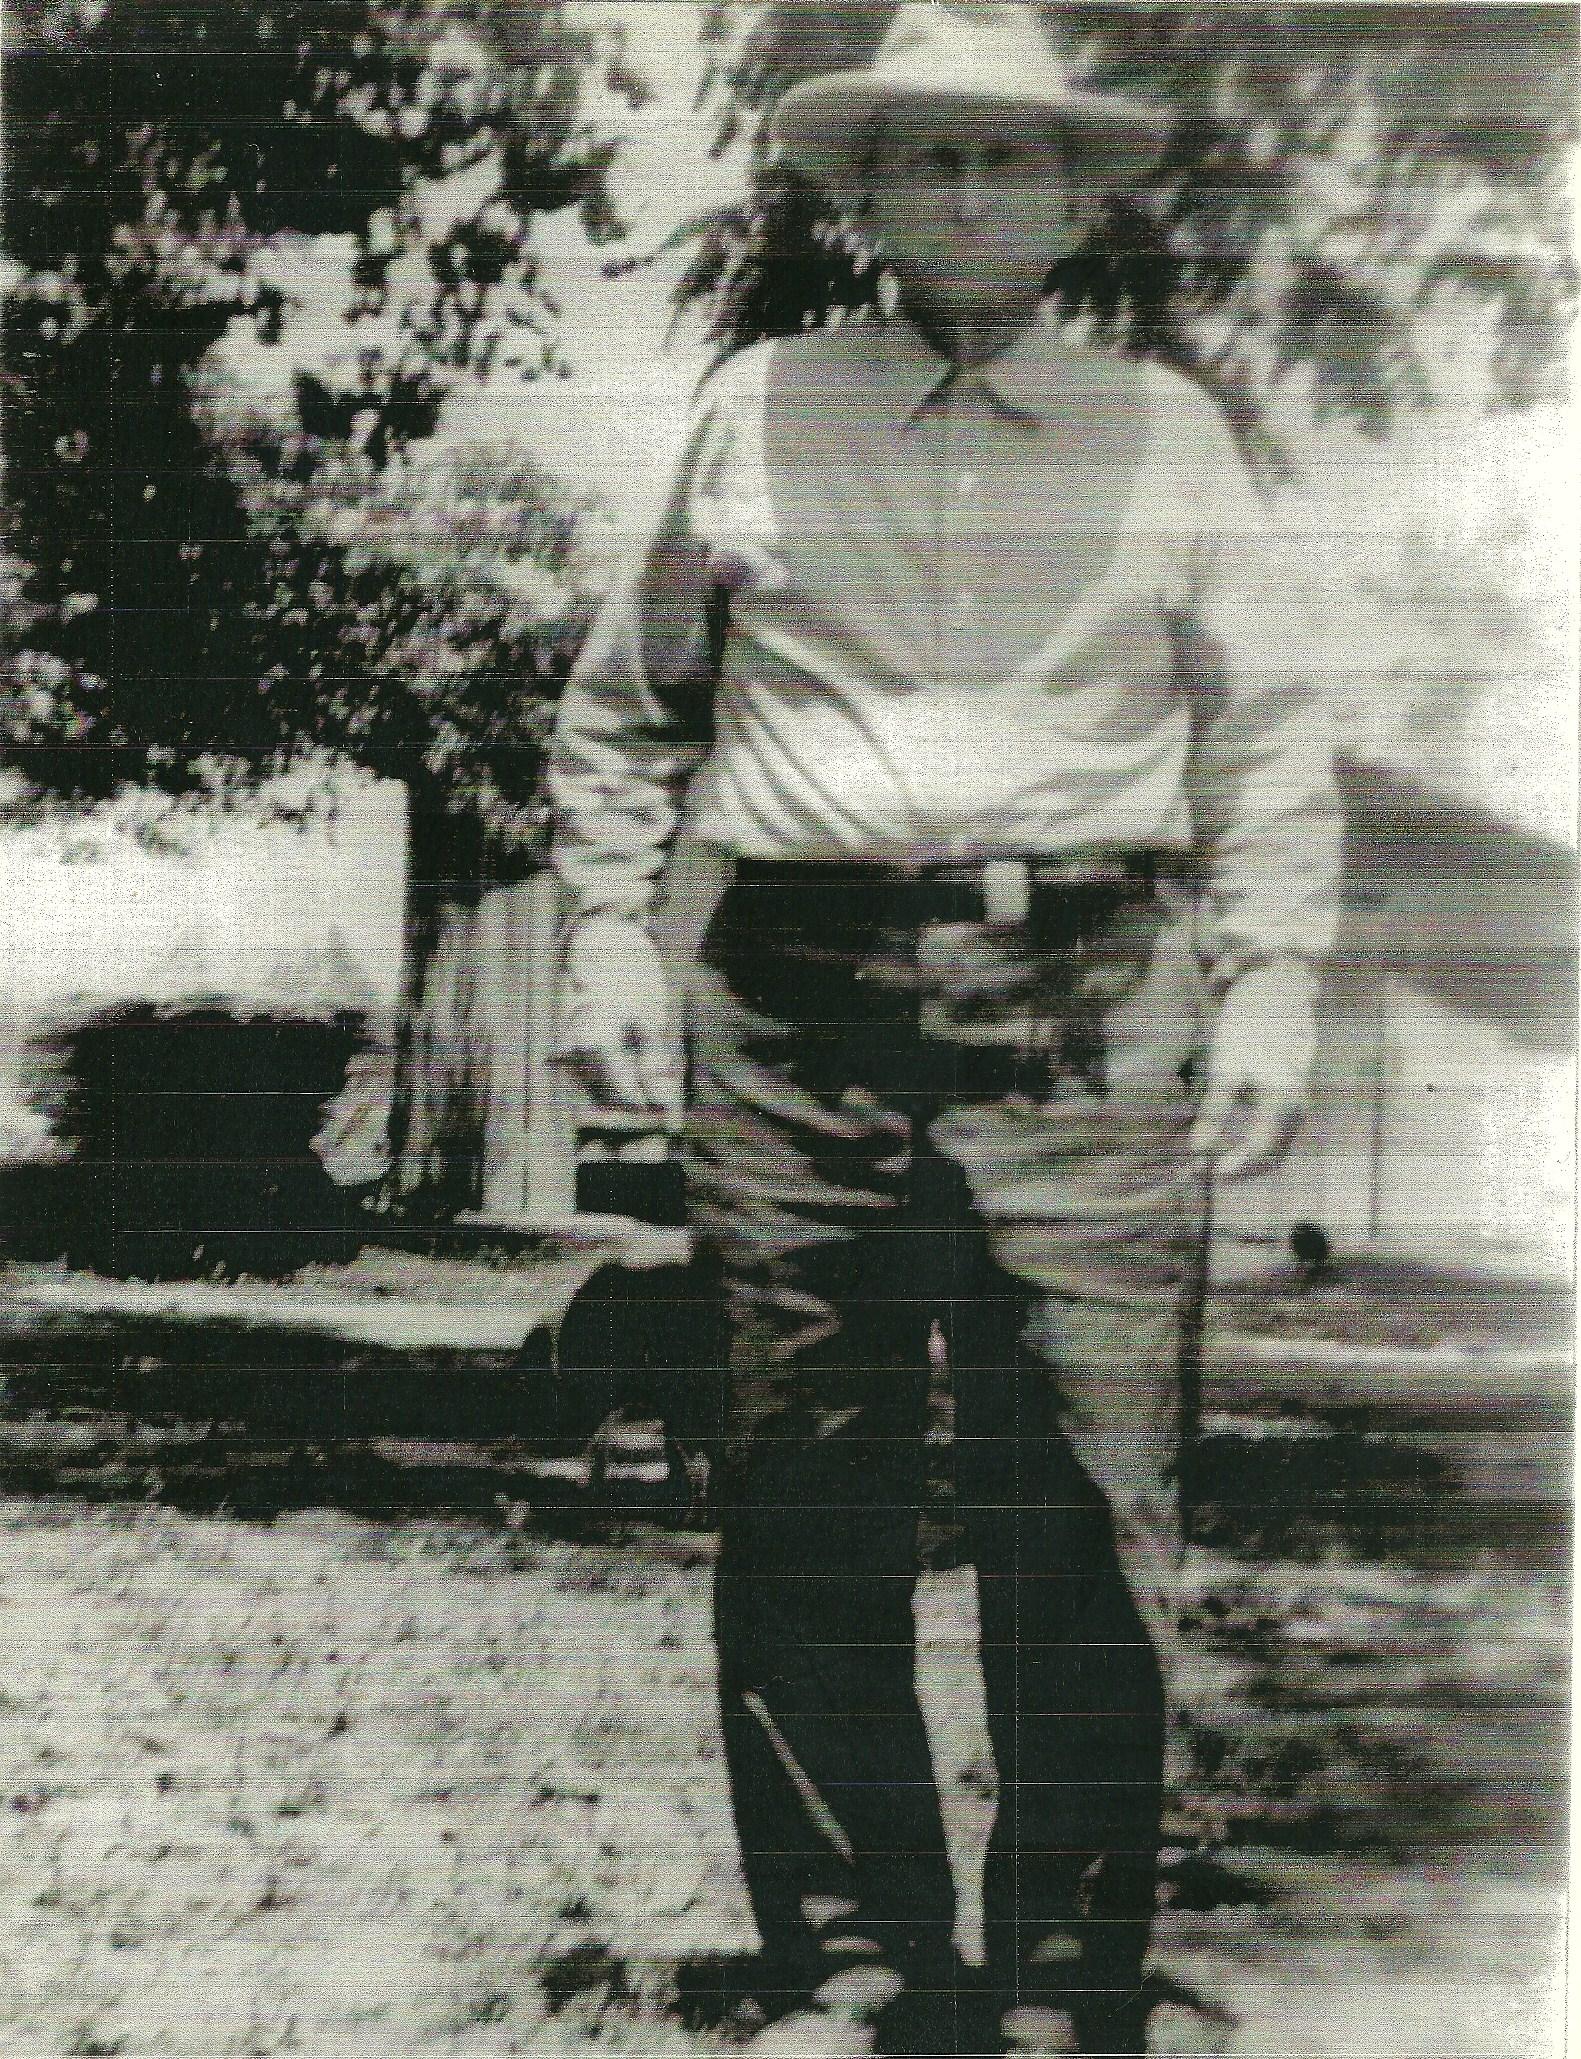 James Monroe Griffin